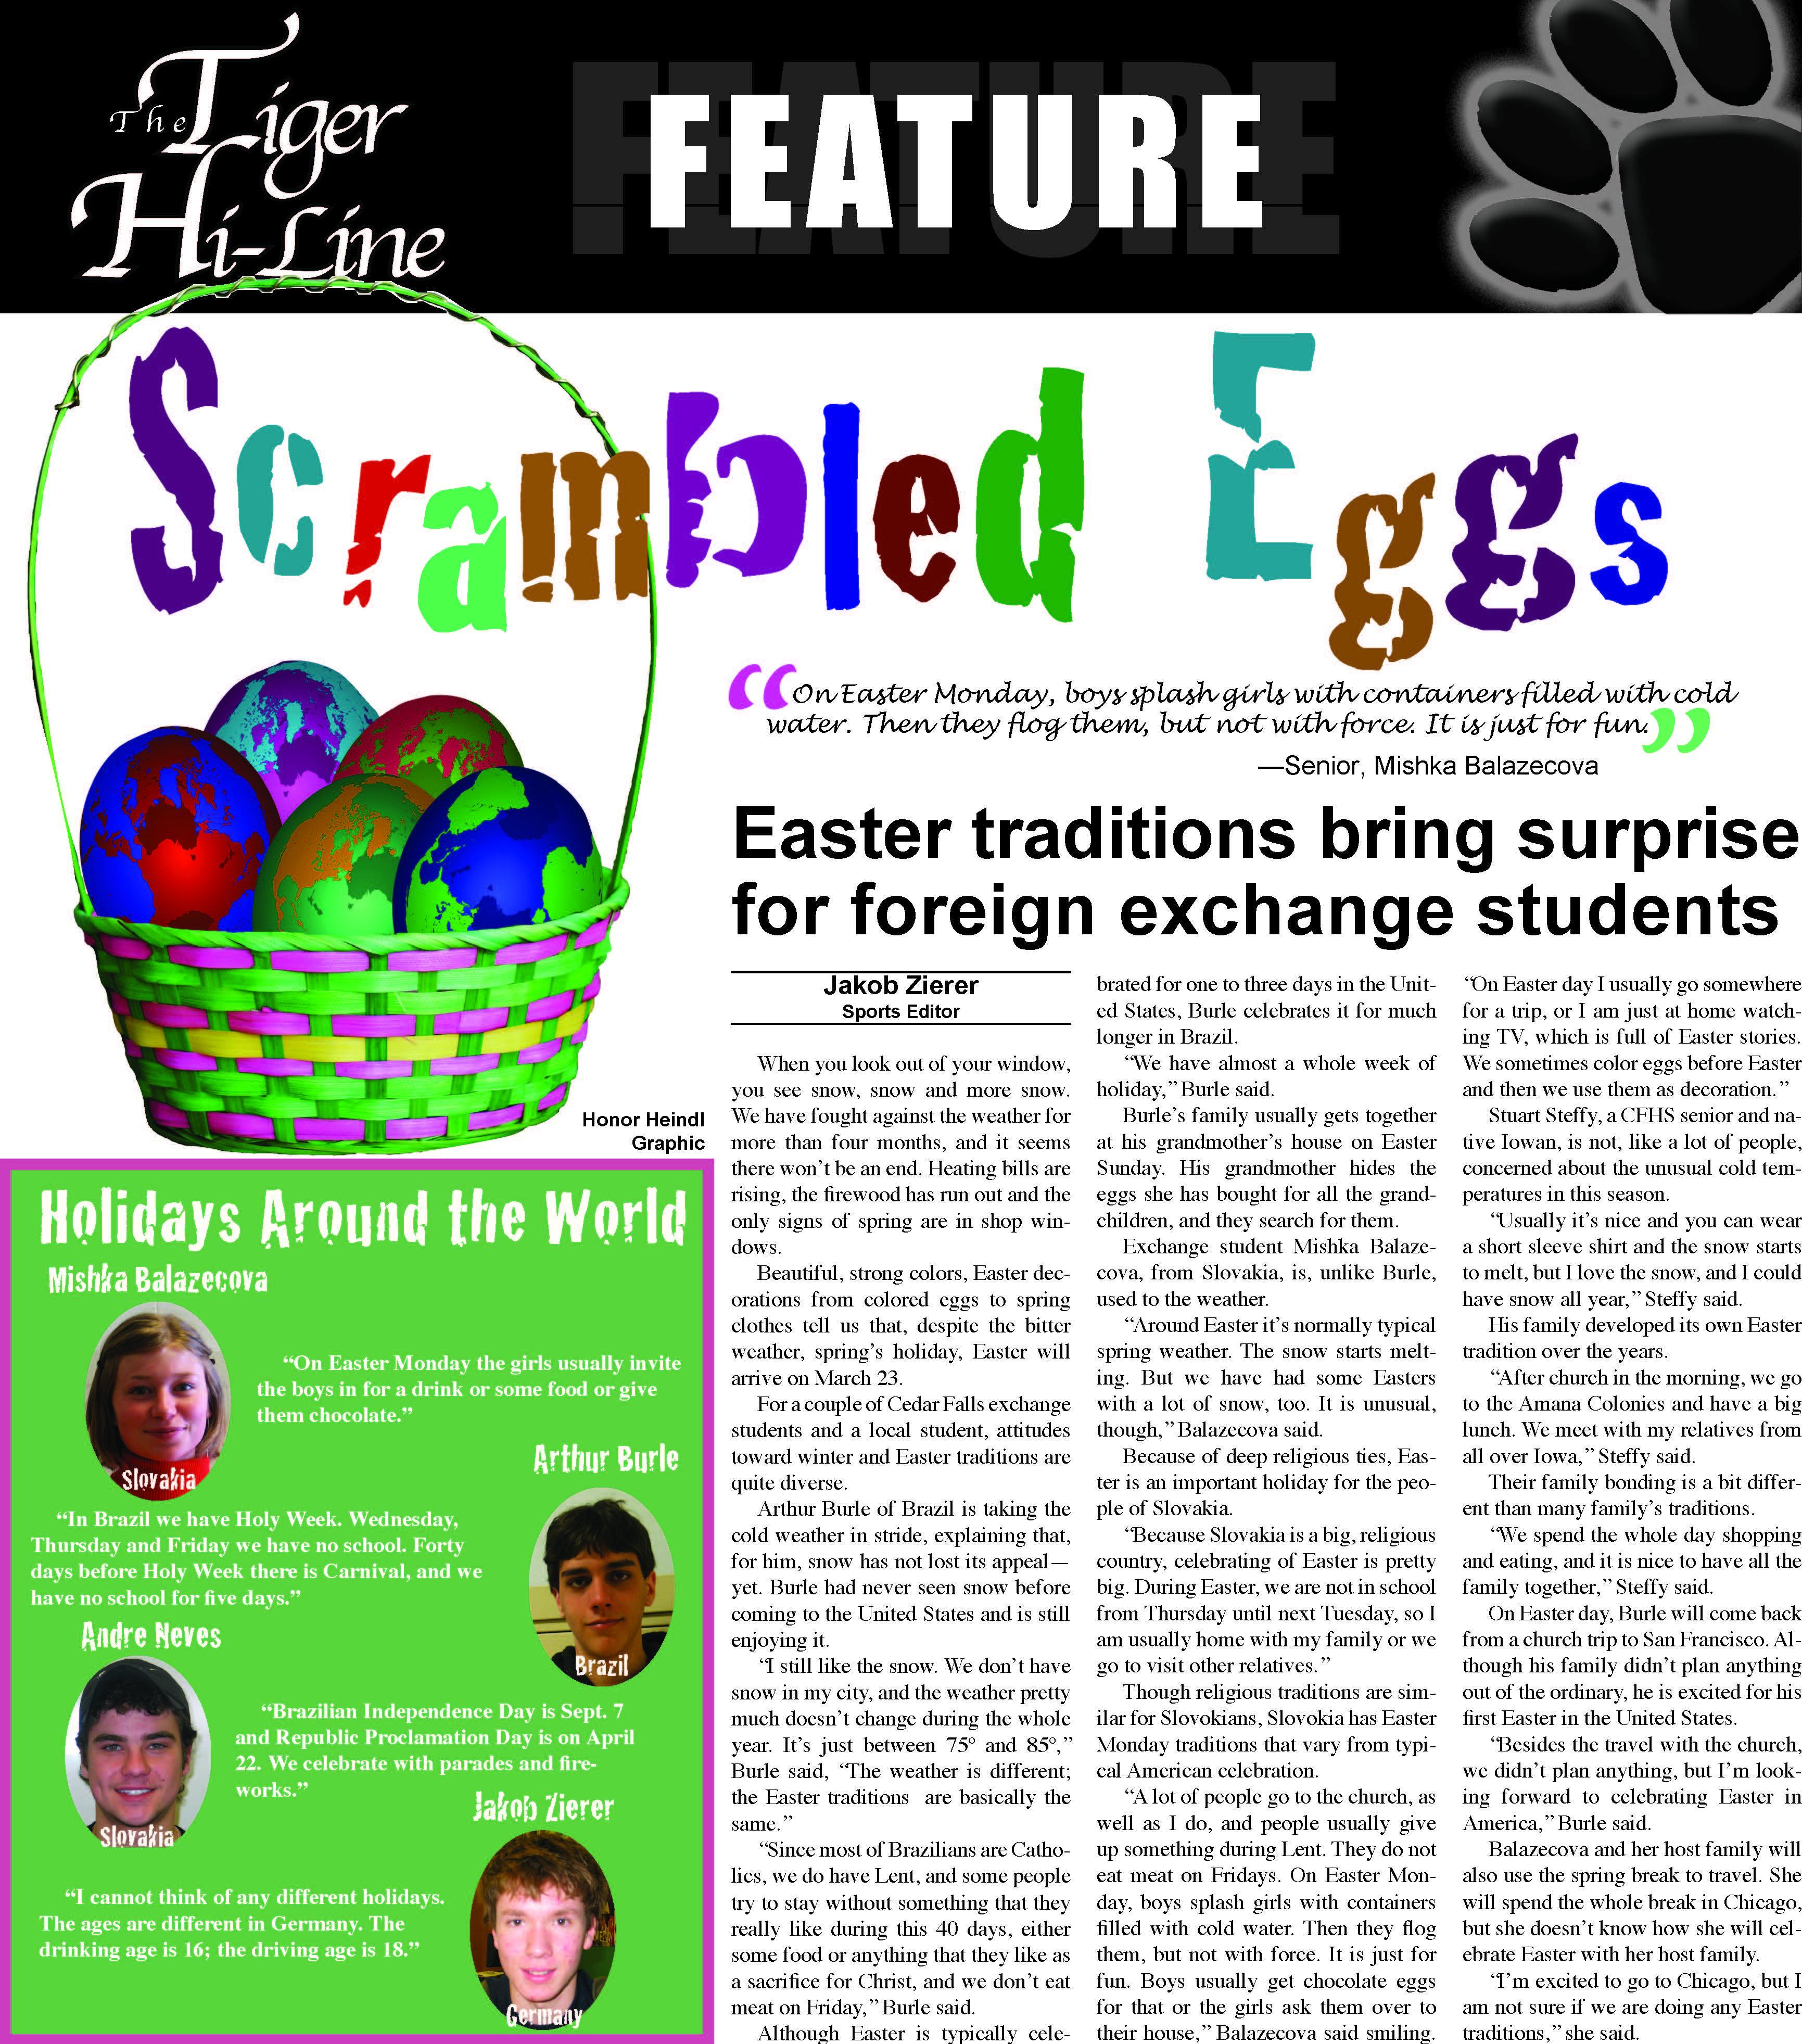 heindl.eggs